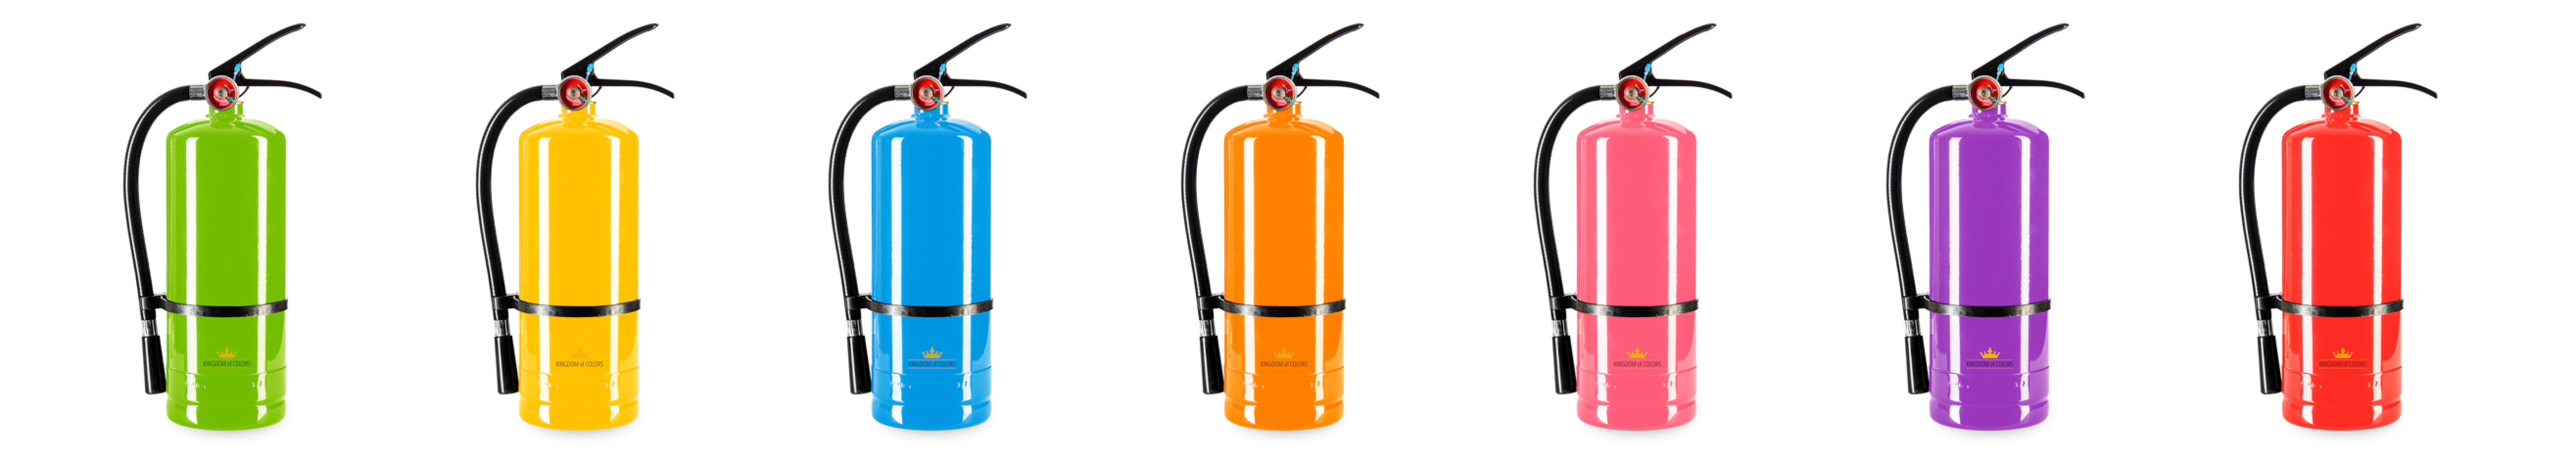 Holi Polvos extintor blower